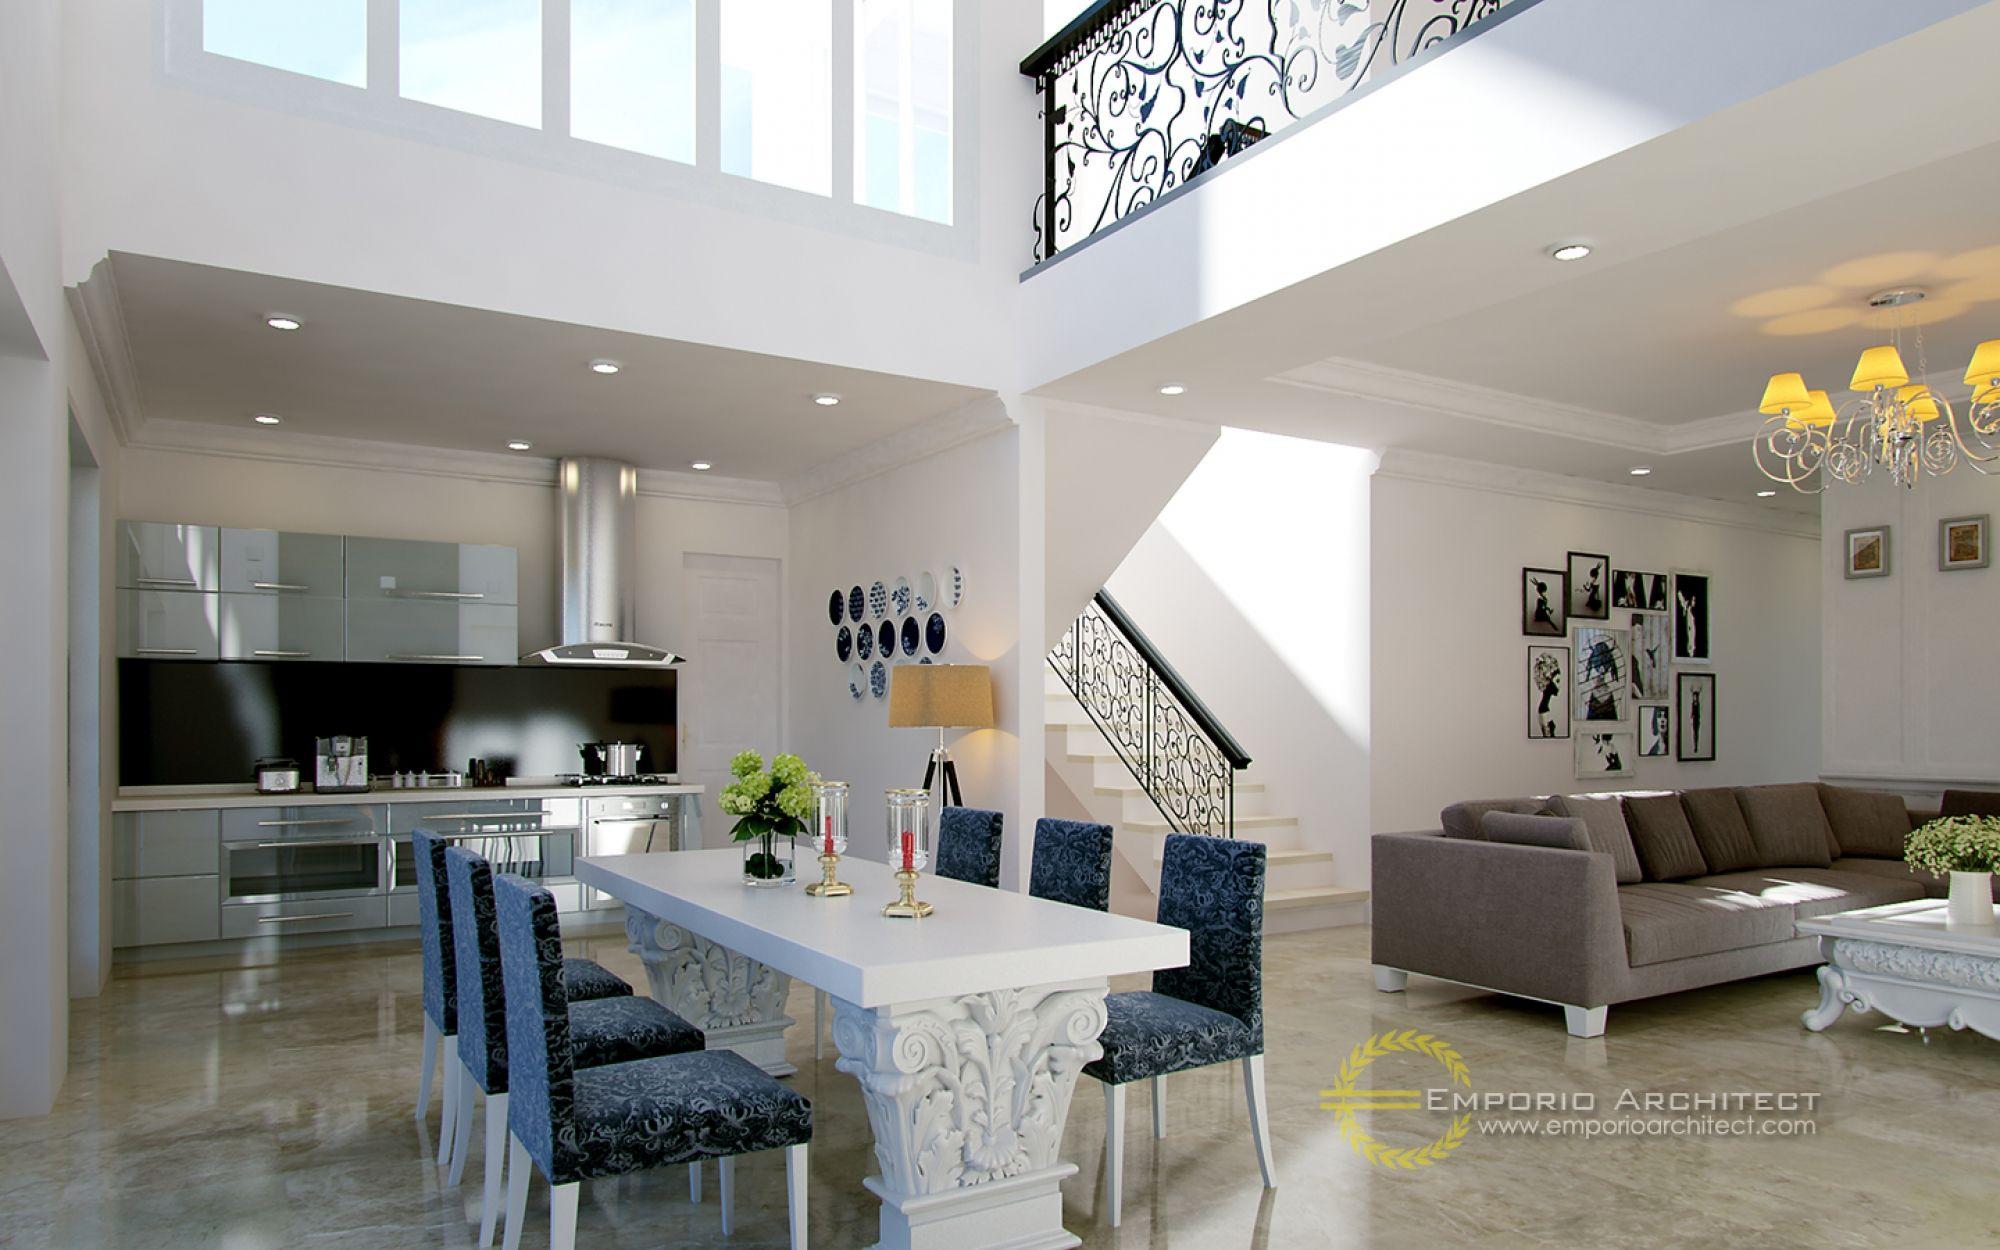 Jasa Desain Interior Rumah - Dining Room #desaininterior #desaininteriorrumah #jasainterior #jasadesaininterior #interiorrumah #jasainteriorrumah #interiorrumahminimalis #interiorrumahmodern